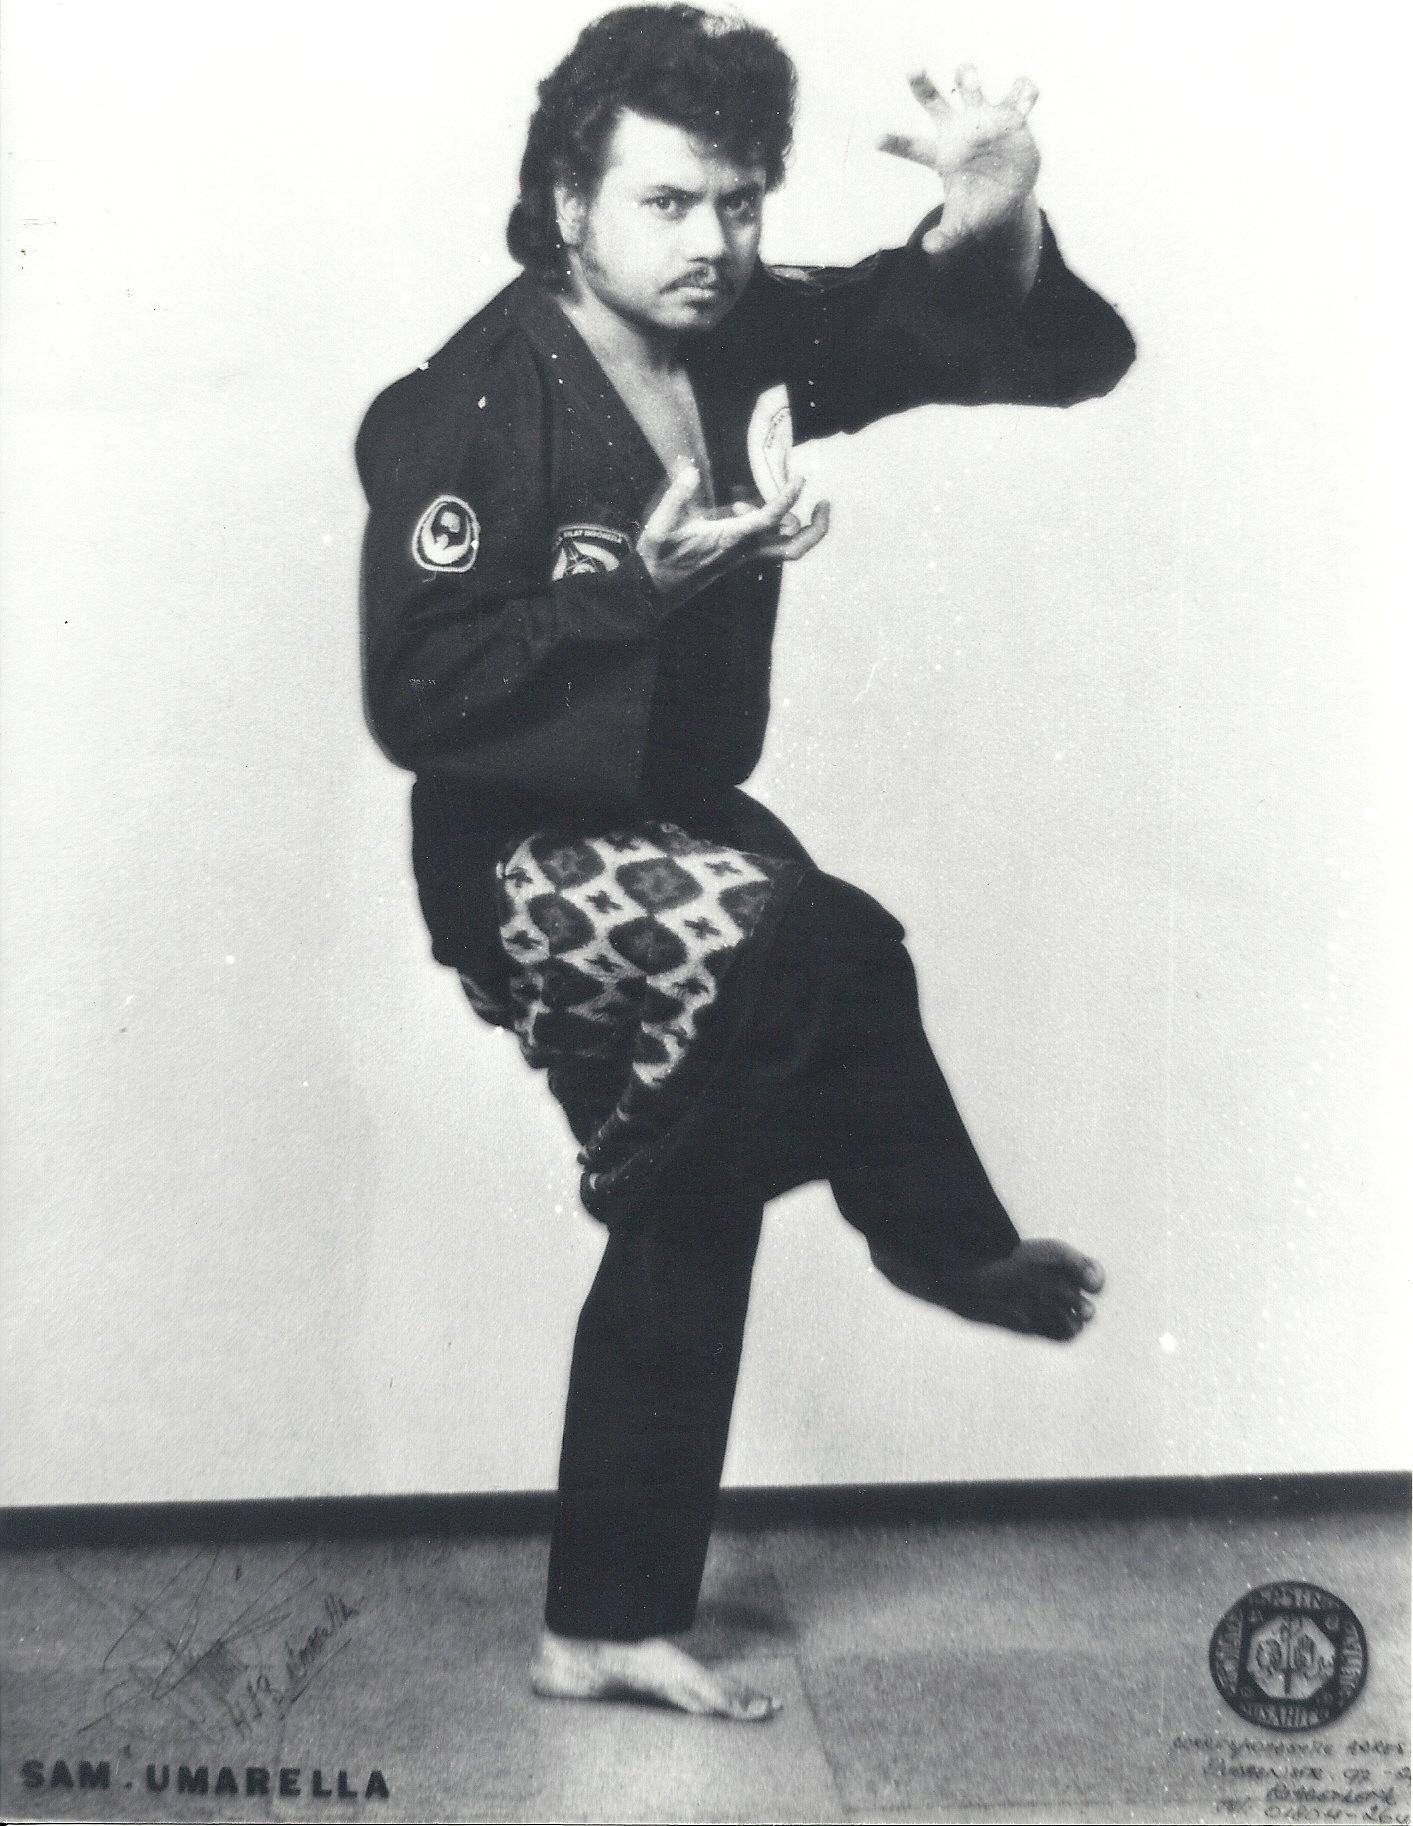 Haji Samad Umarella (1942-2013†)